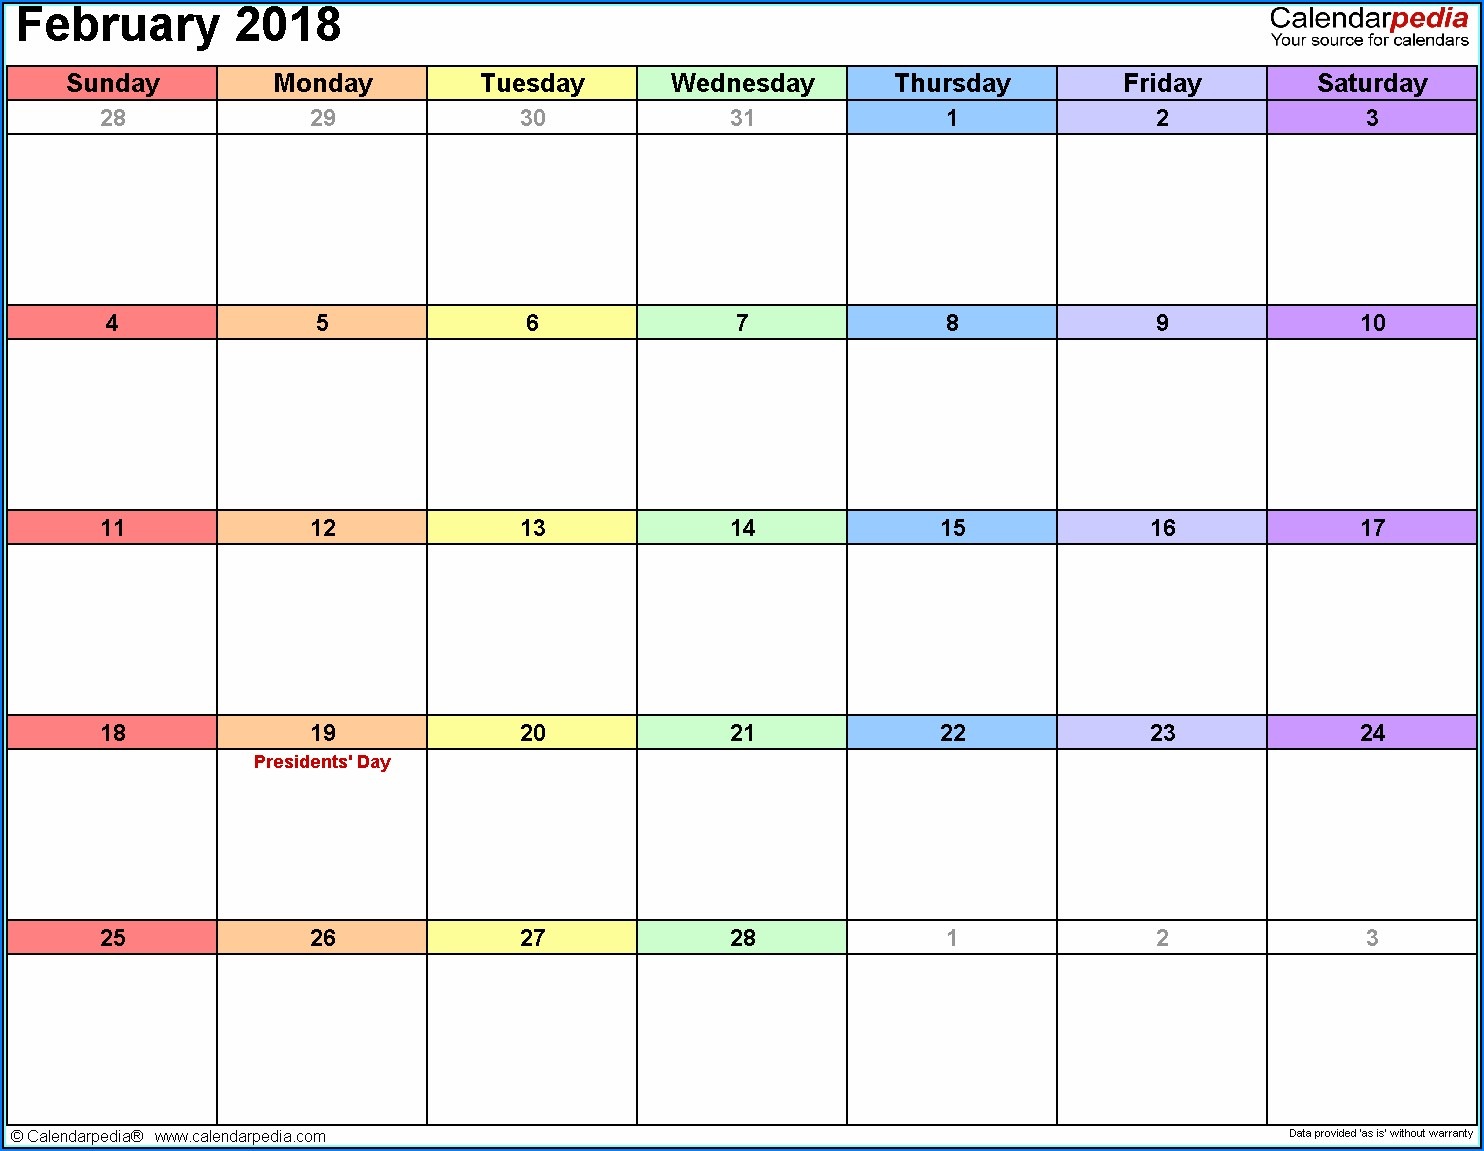 Free Scheduling Calendar Template 2018